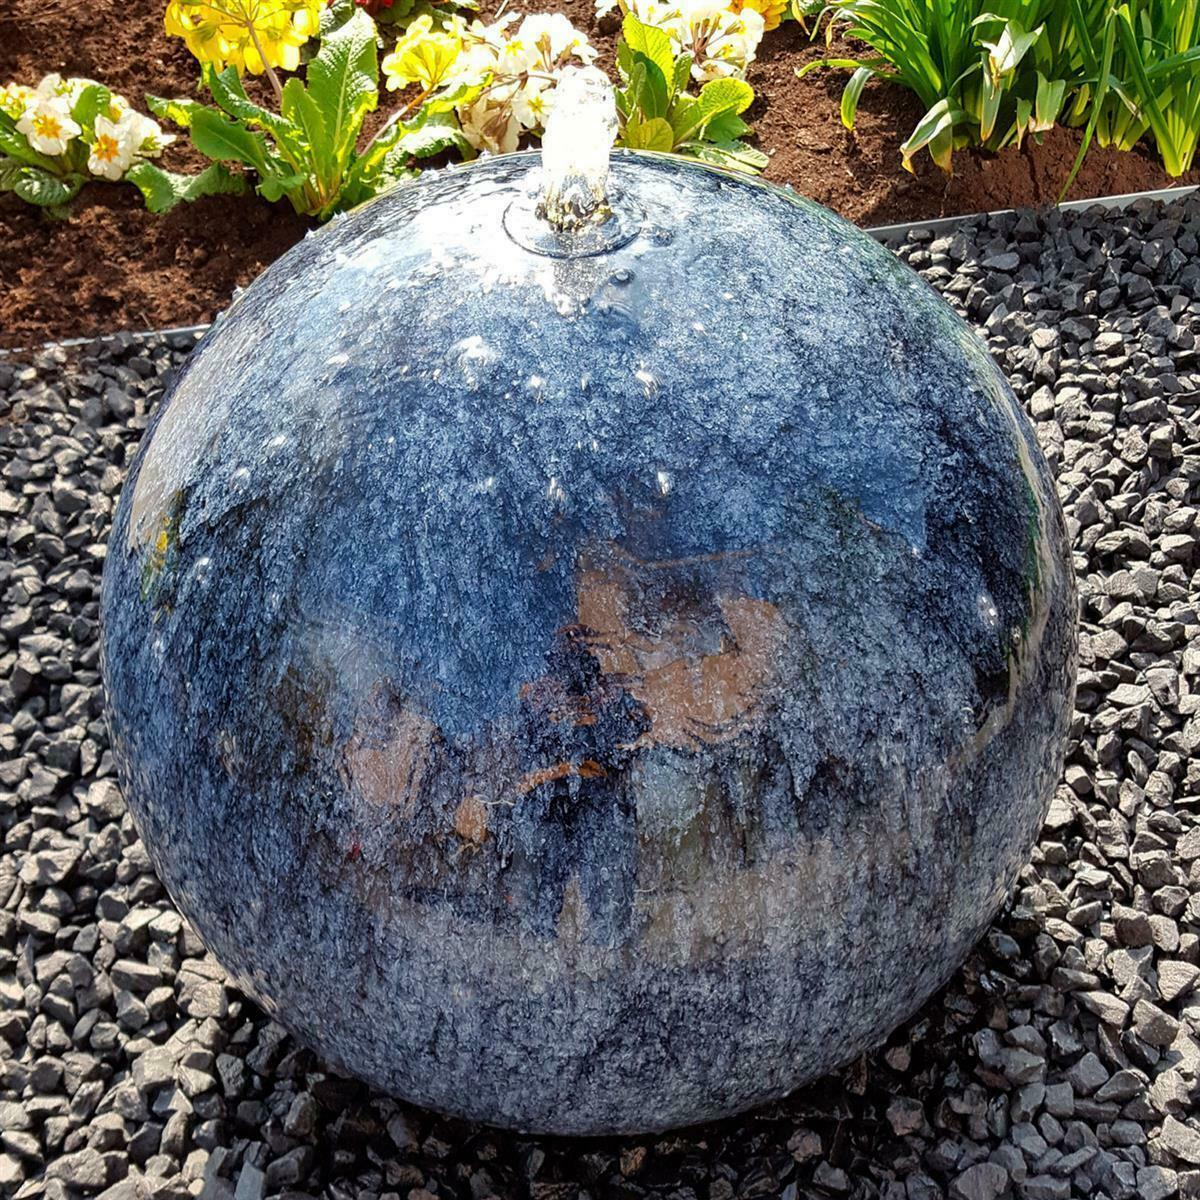 LED Komplettset Gartenbrunnen Wasserspiel Edelstahl matt geb/ürstet Kugelbrunnen 60 cm incl